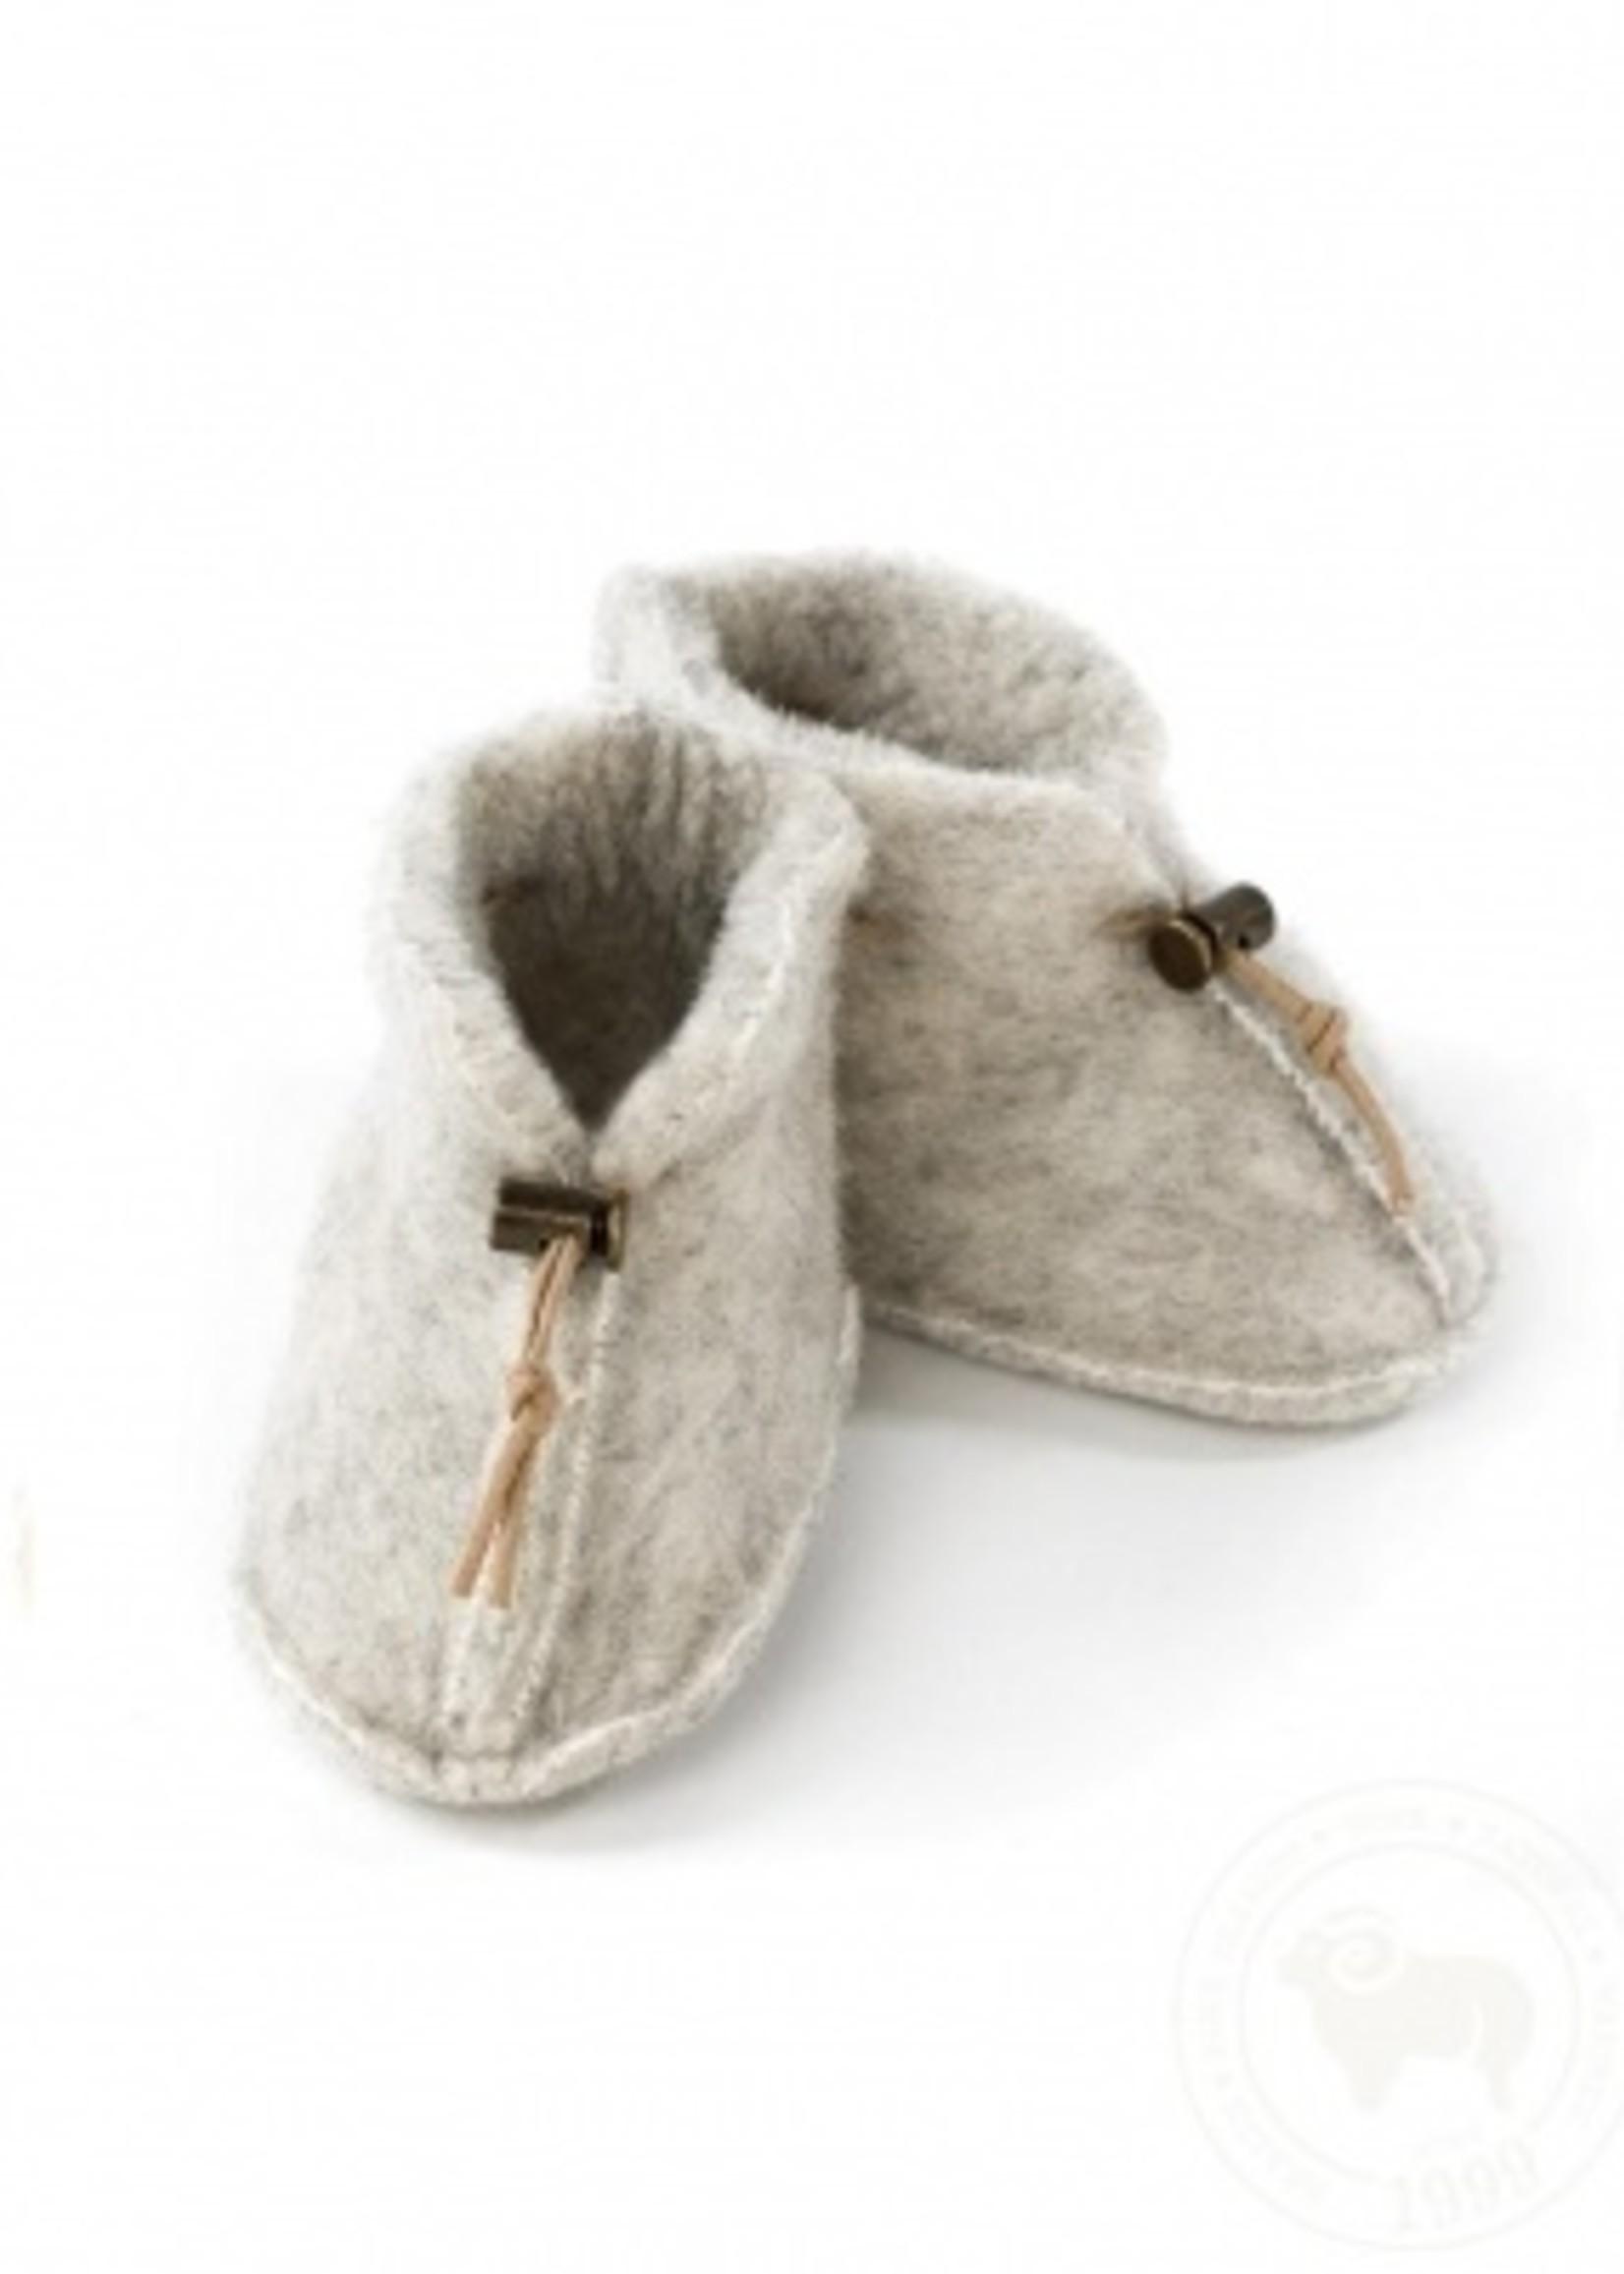 Alwero Slippers 100% emowool - Grey